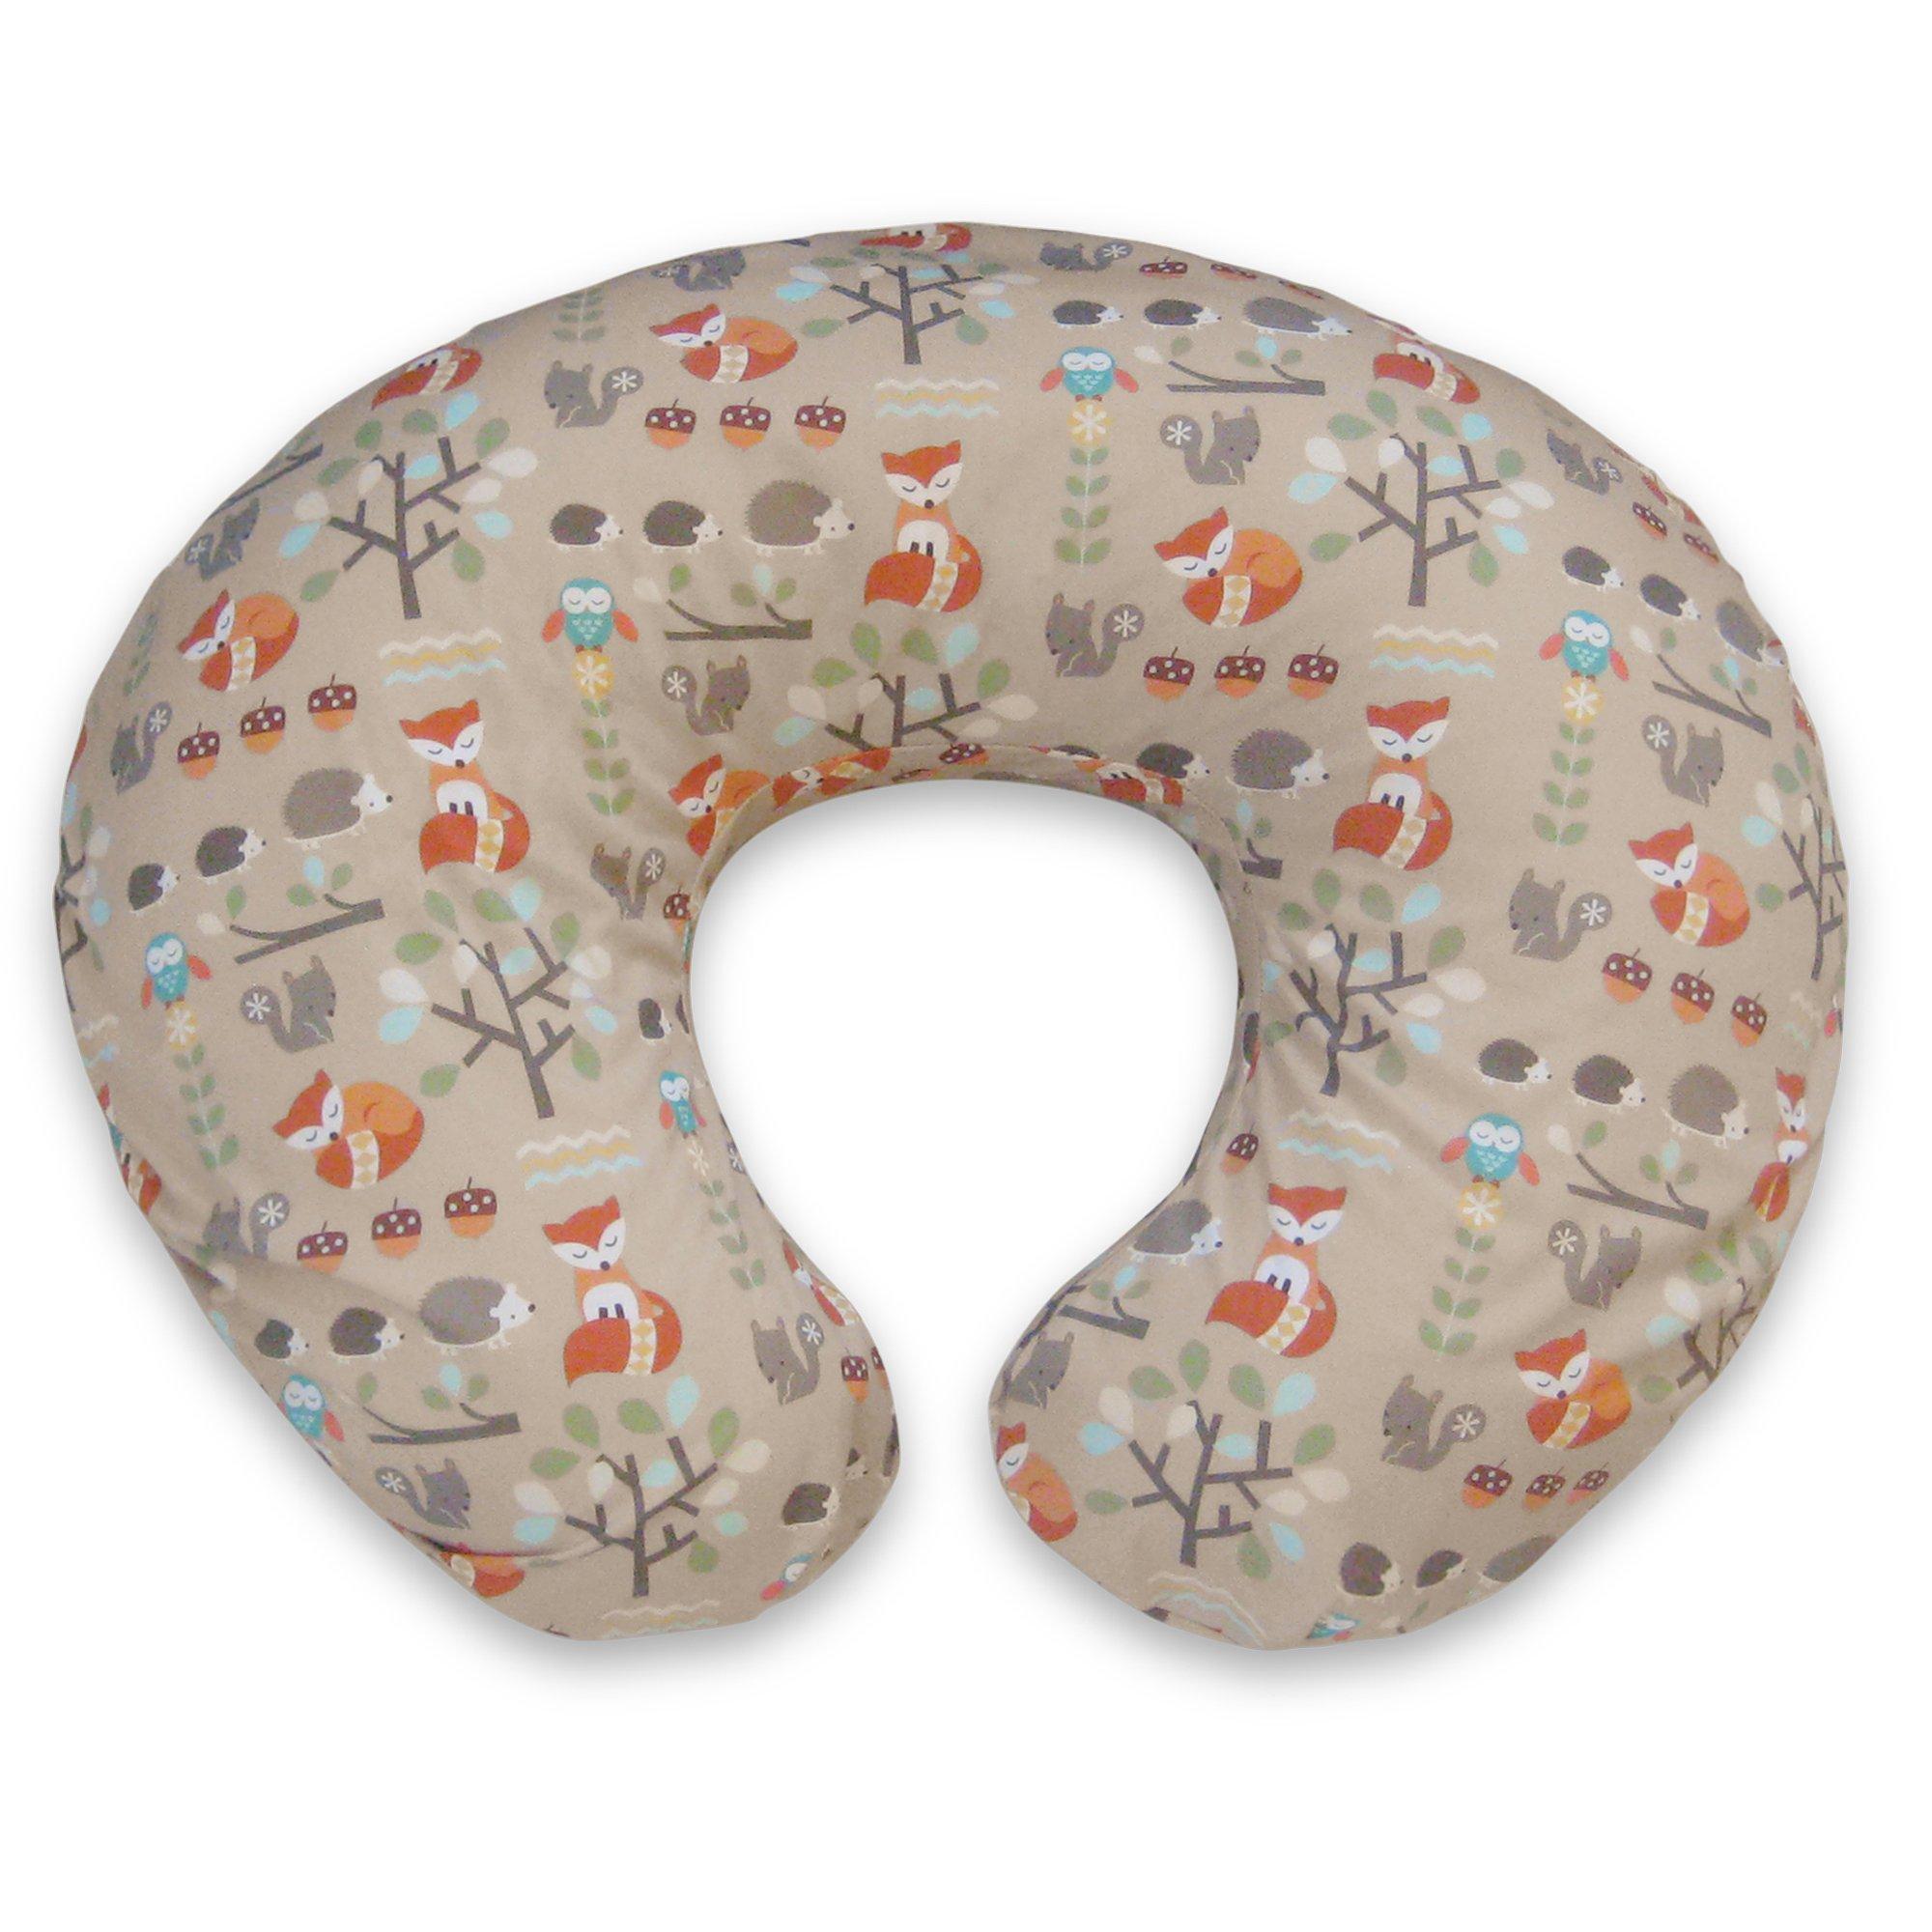 Boppy Pillow Slipcover, Classic Fox Forest/Tan by Boppy